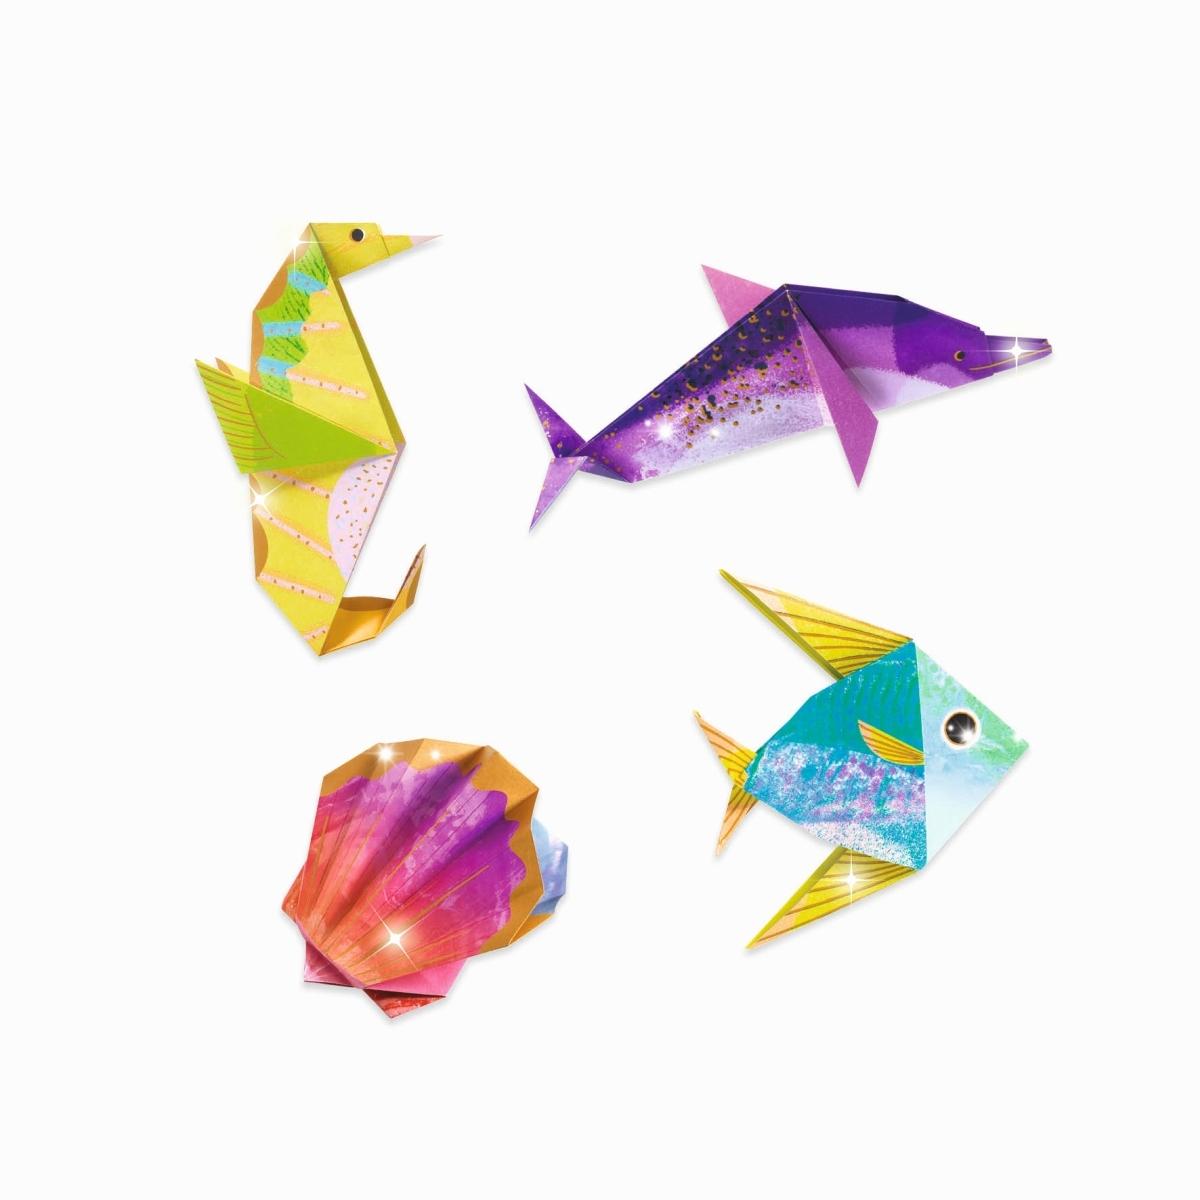 Djeco Origami Meerestiere concernant Origami Petit Bateau